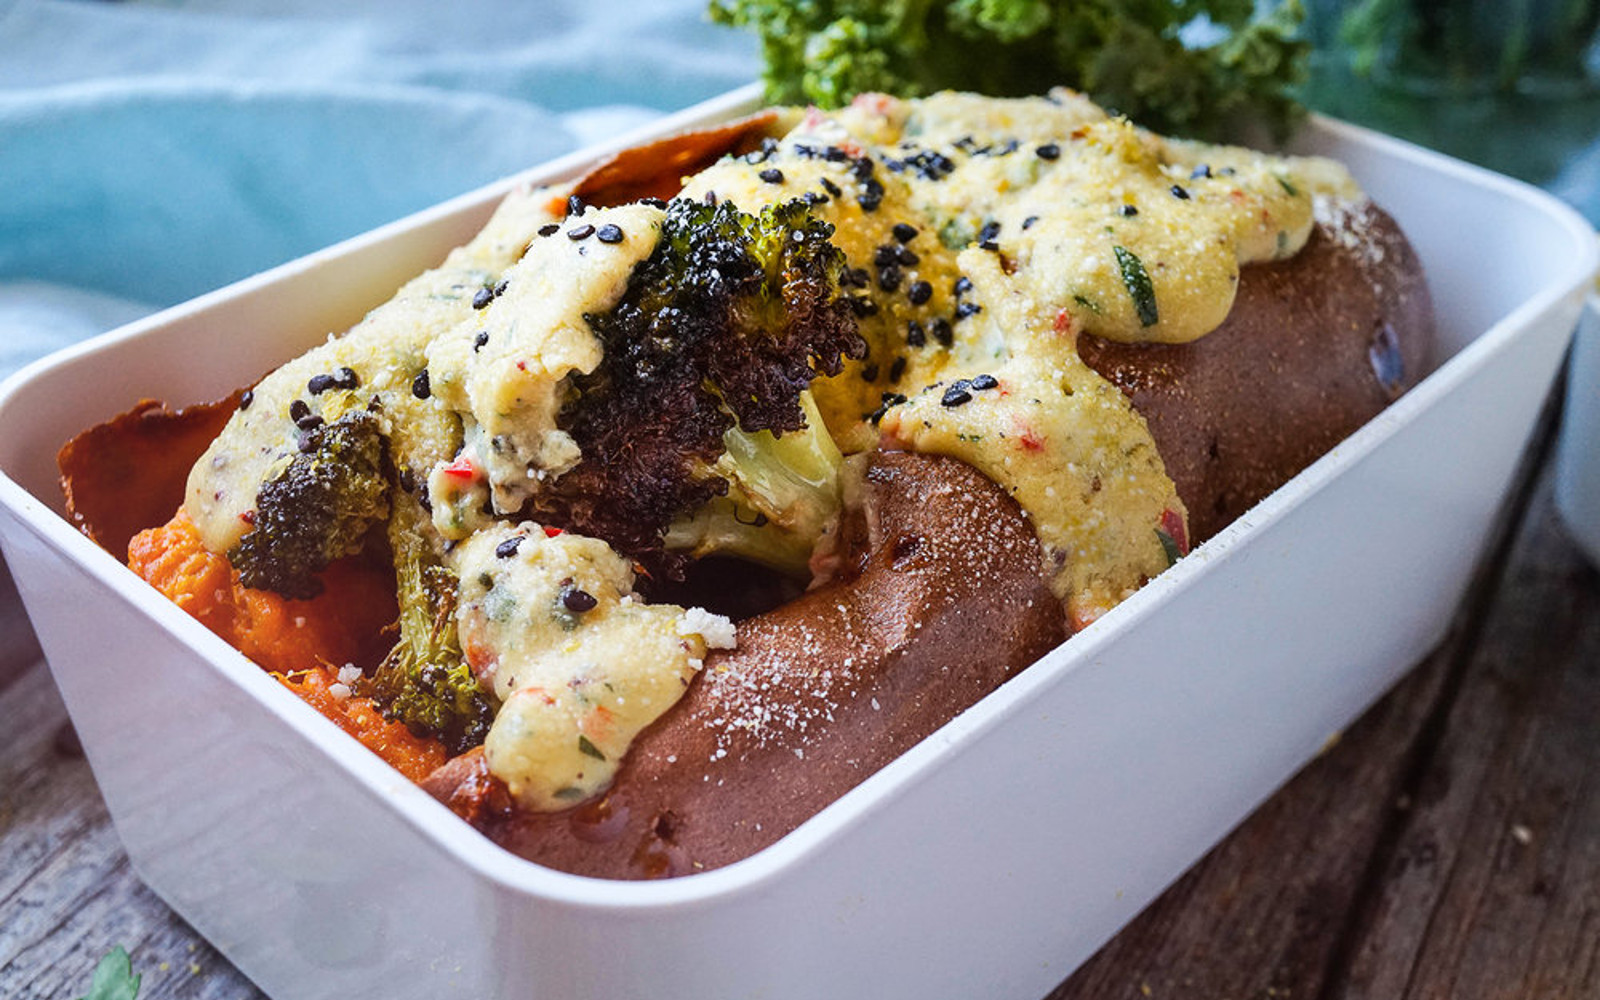 Vegan Roasted Sweet Potato and Broccoli With Cheesy Sauce